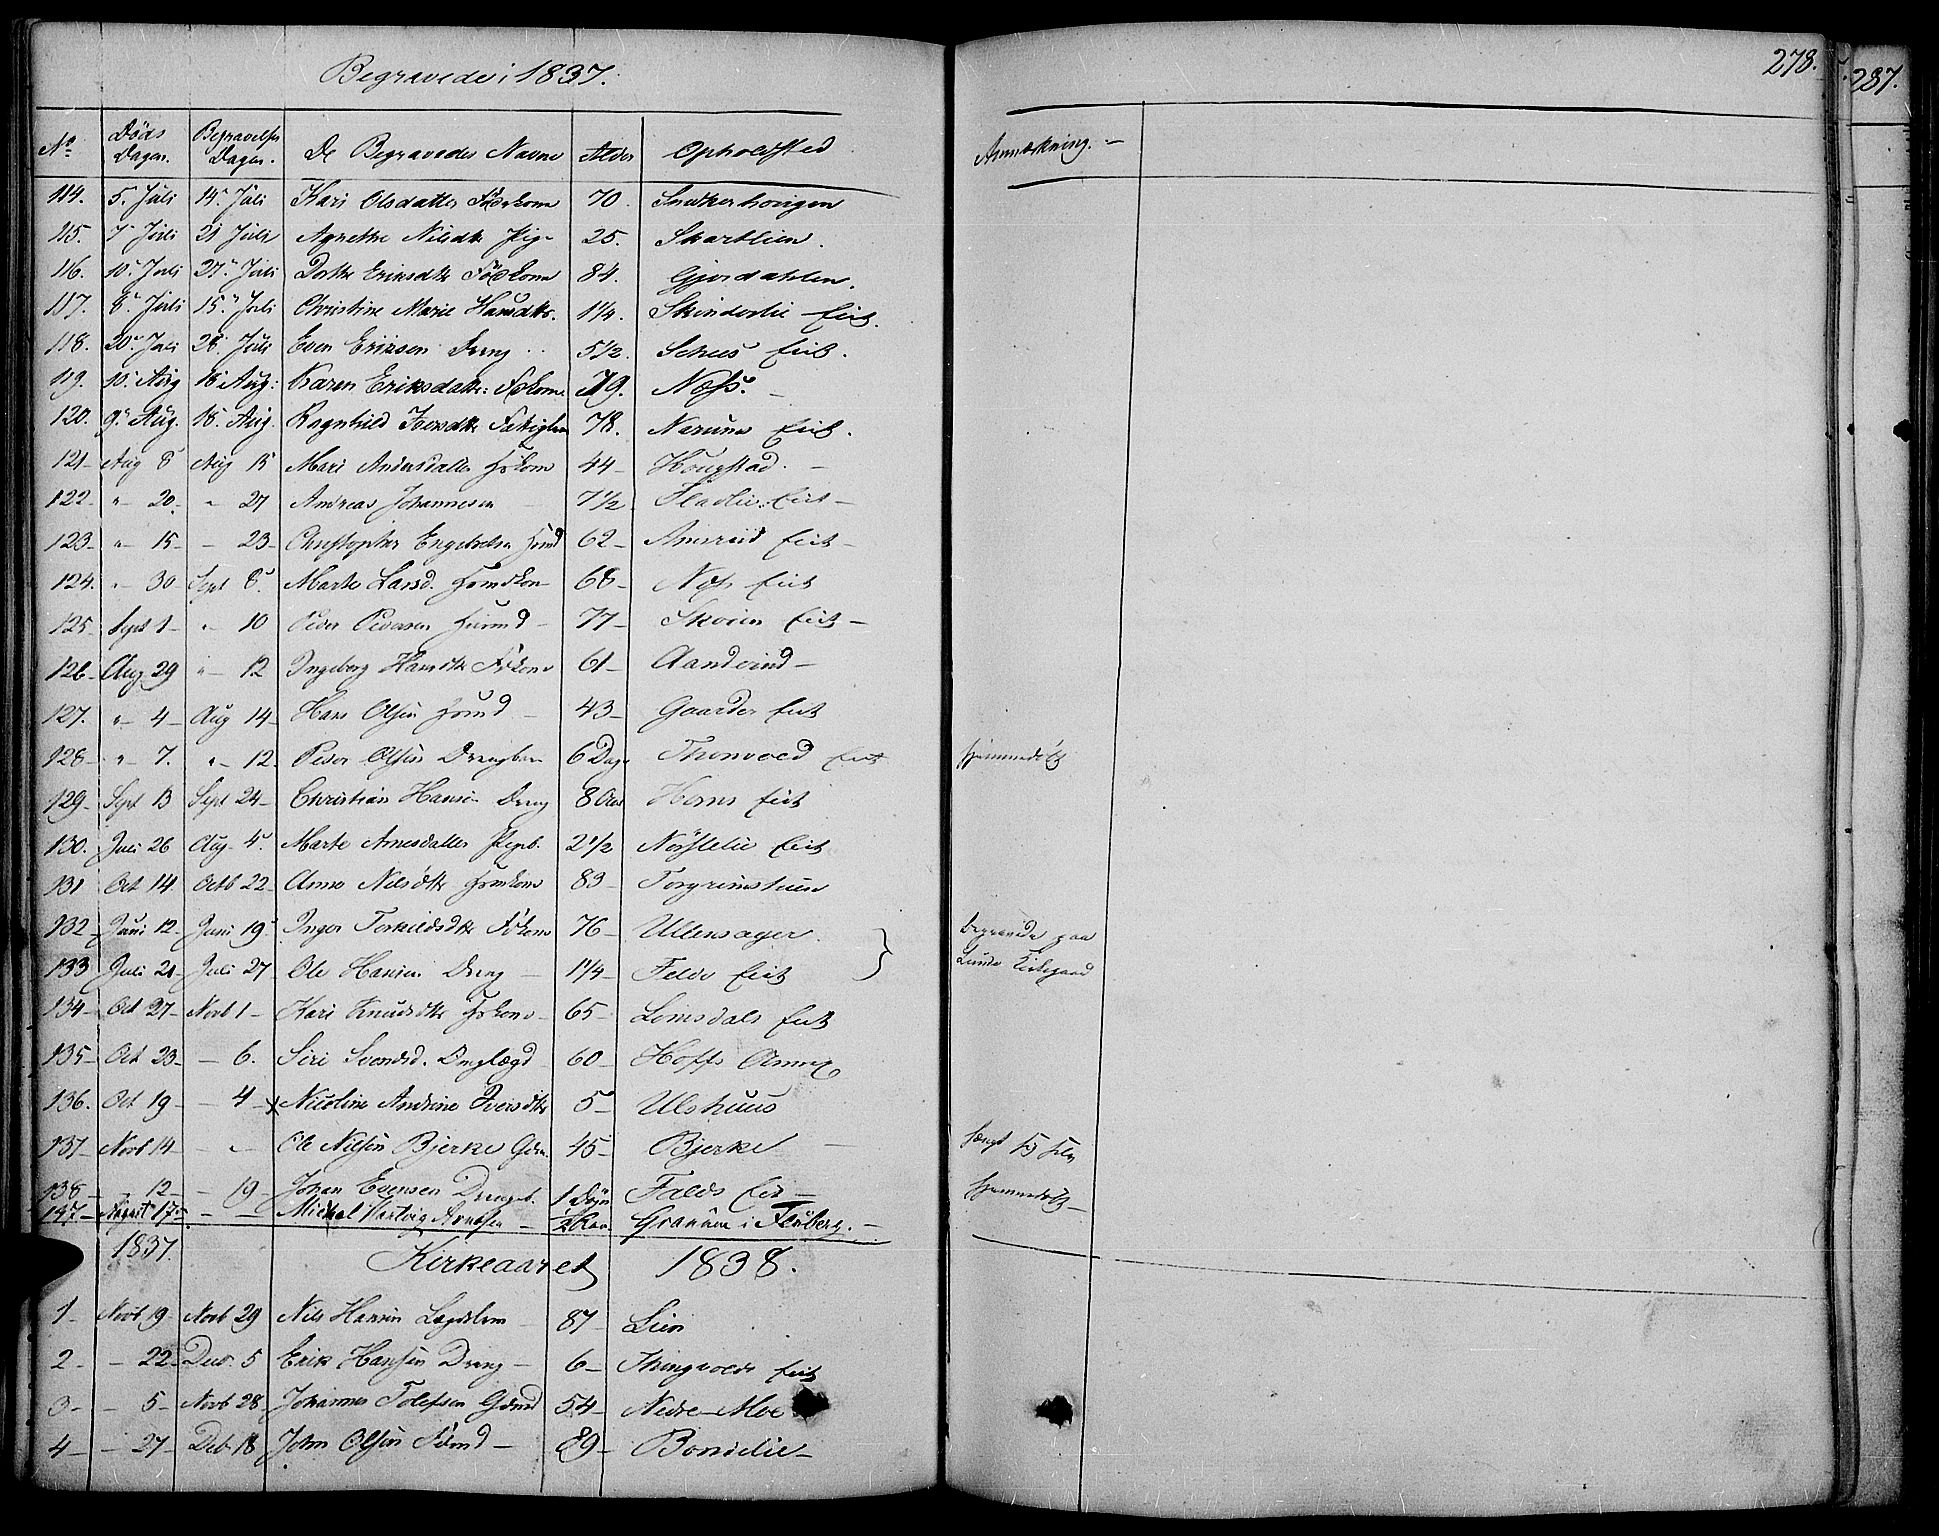 SAH, Land prestekontor, Ministerialbok nr. 8, 1830-1846, s. 278